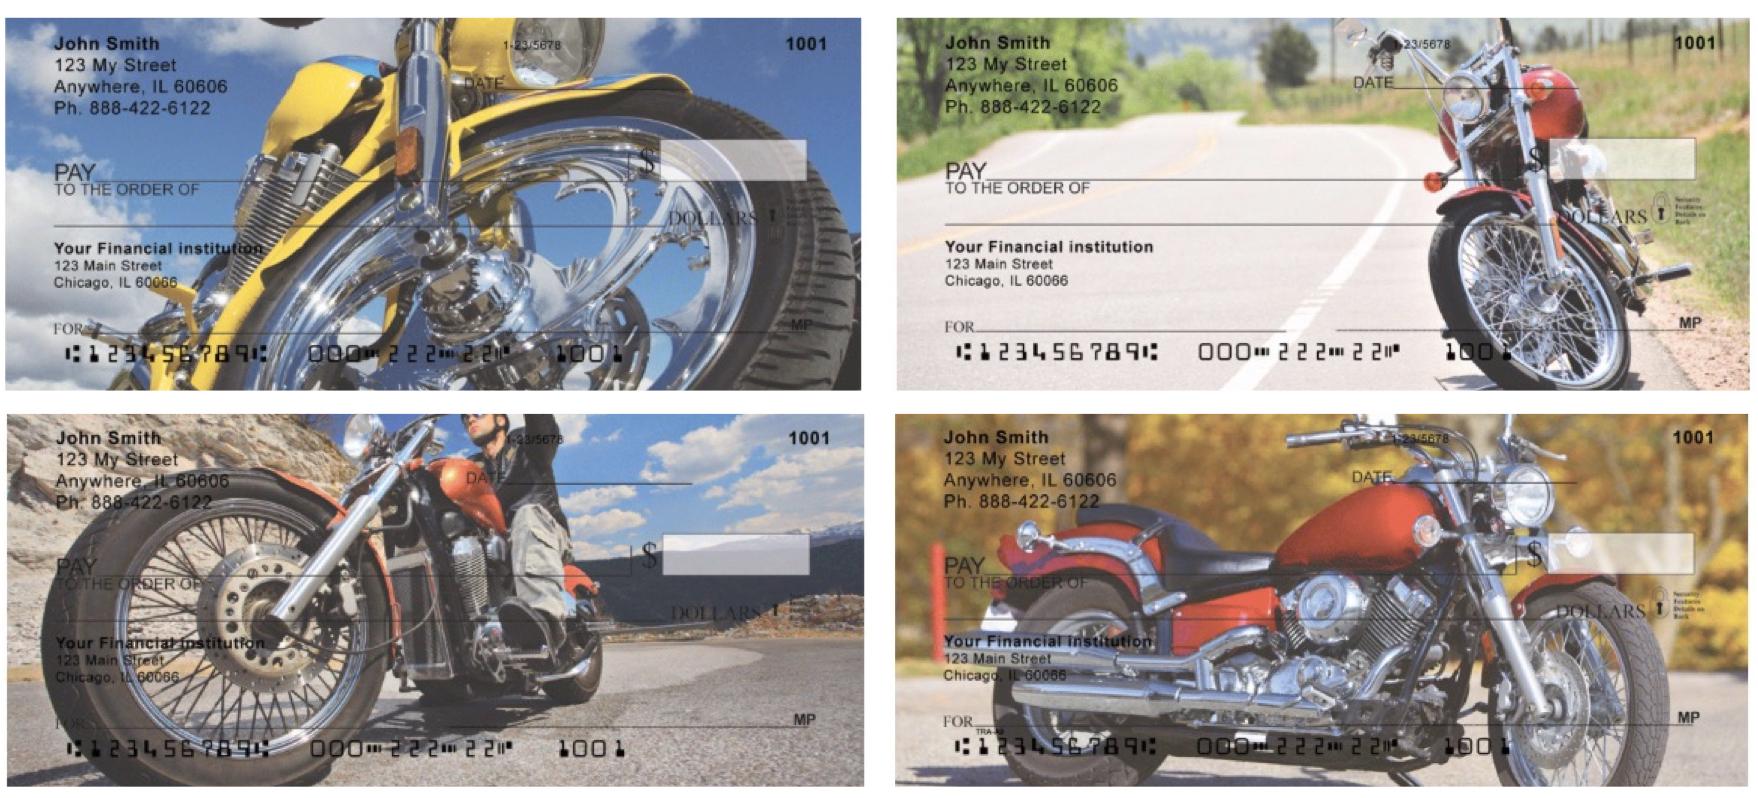 Cruising Motorcycles Personal Checks, Motorcycle Checks